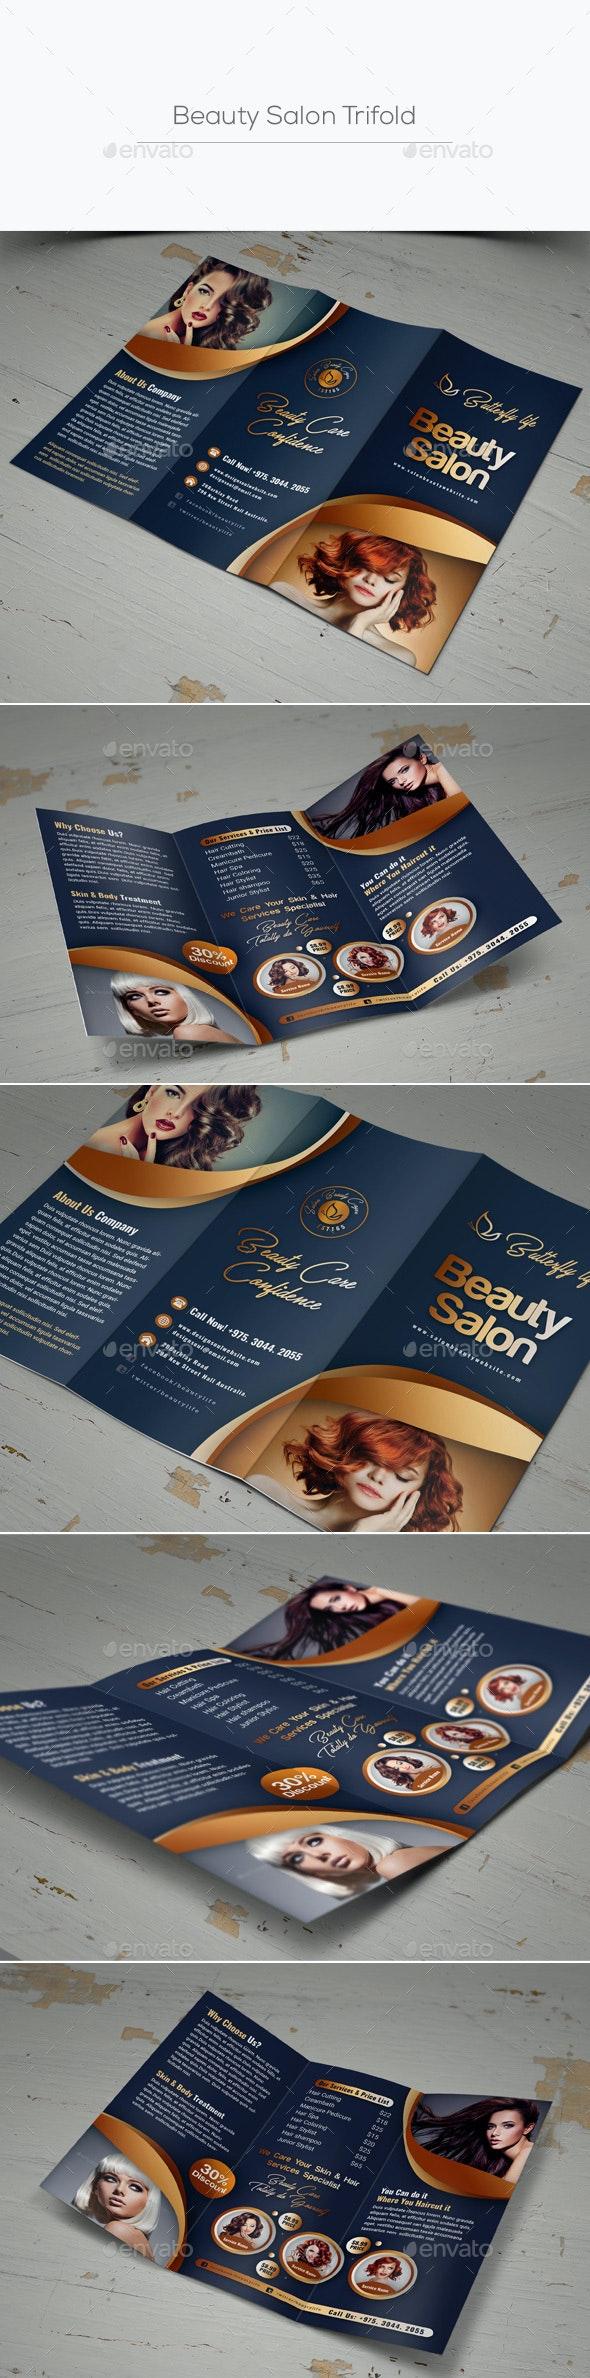 Beauty Salon Trifold - Corporate Brochures